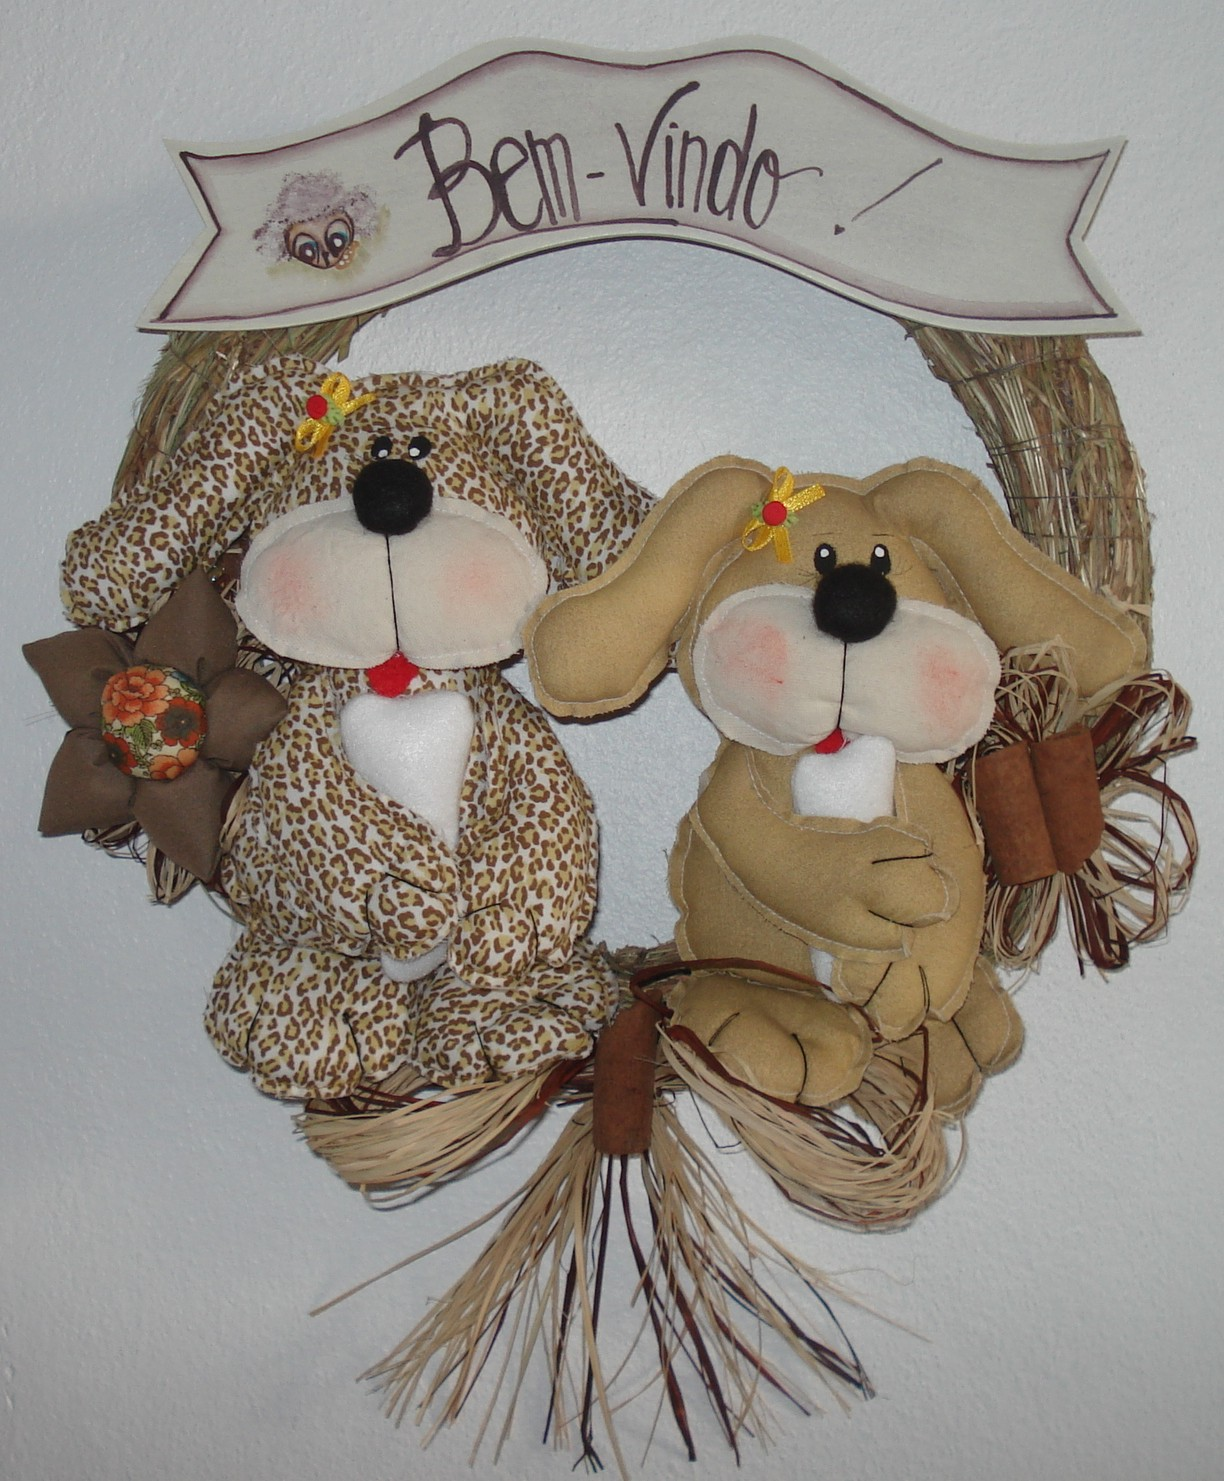 Cód. 1010 Guirlanda casal de cachorros de 30 cm; cores:neutras. #634735 1224x1481 Banheiro De Cachorro